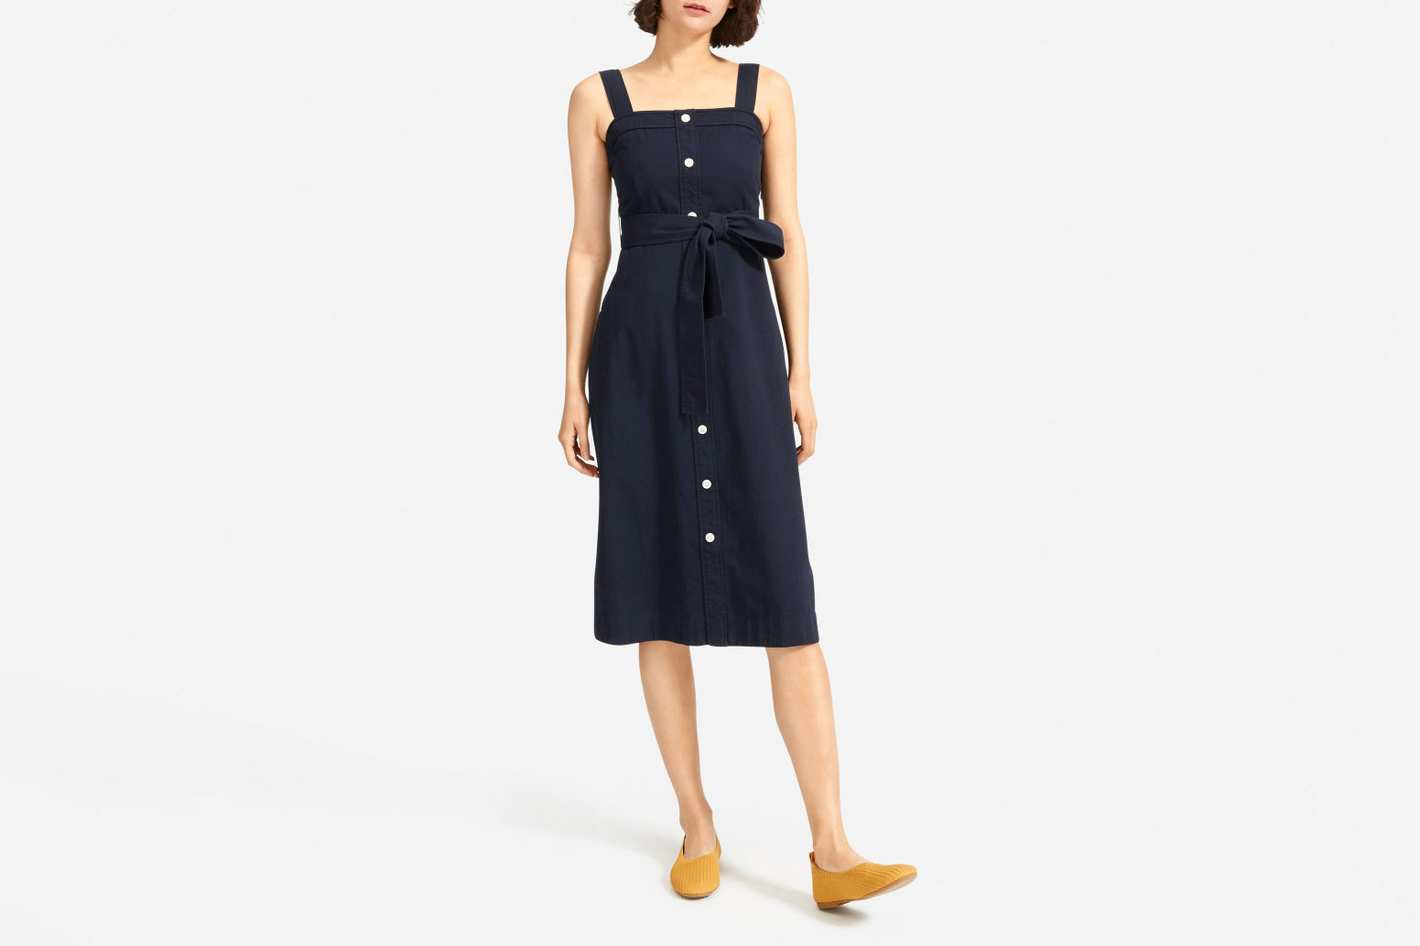 Everlane Cotton-Weave Picnic Dress